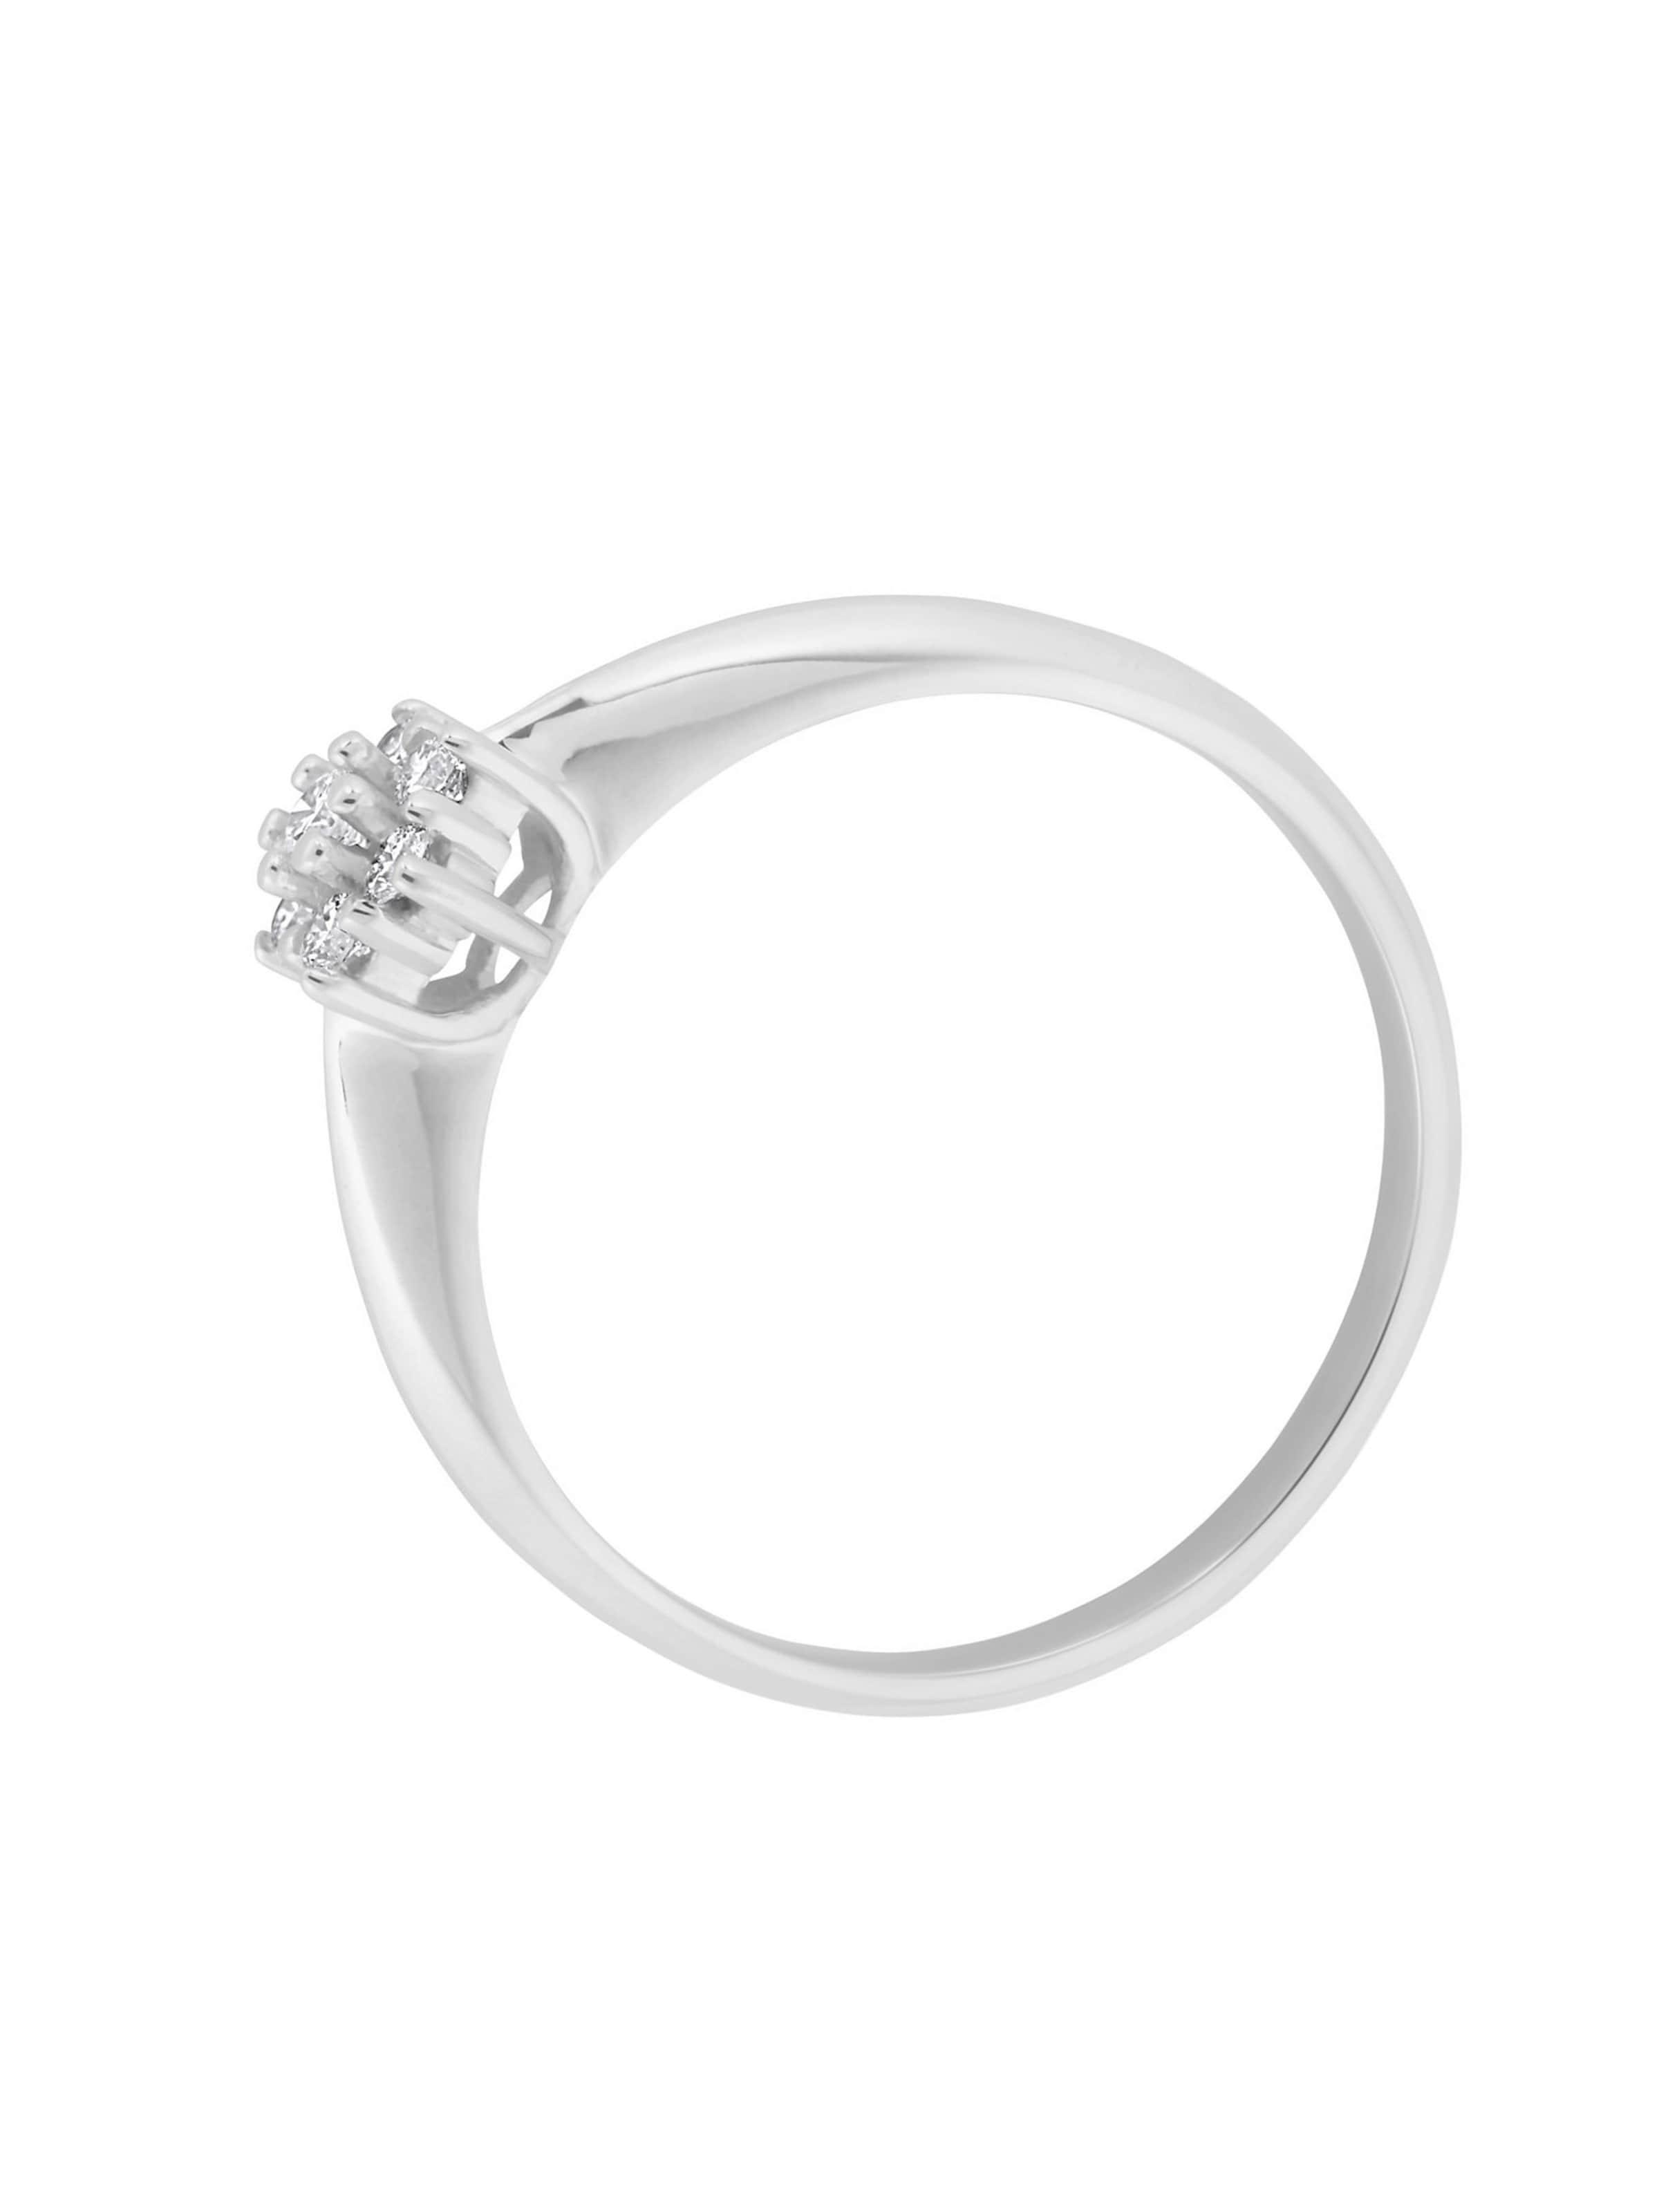 Ring In Ring Christ Silber In Silber Christ 3qjAR54L